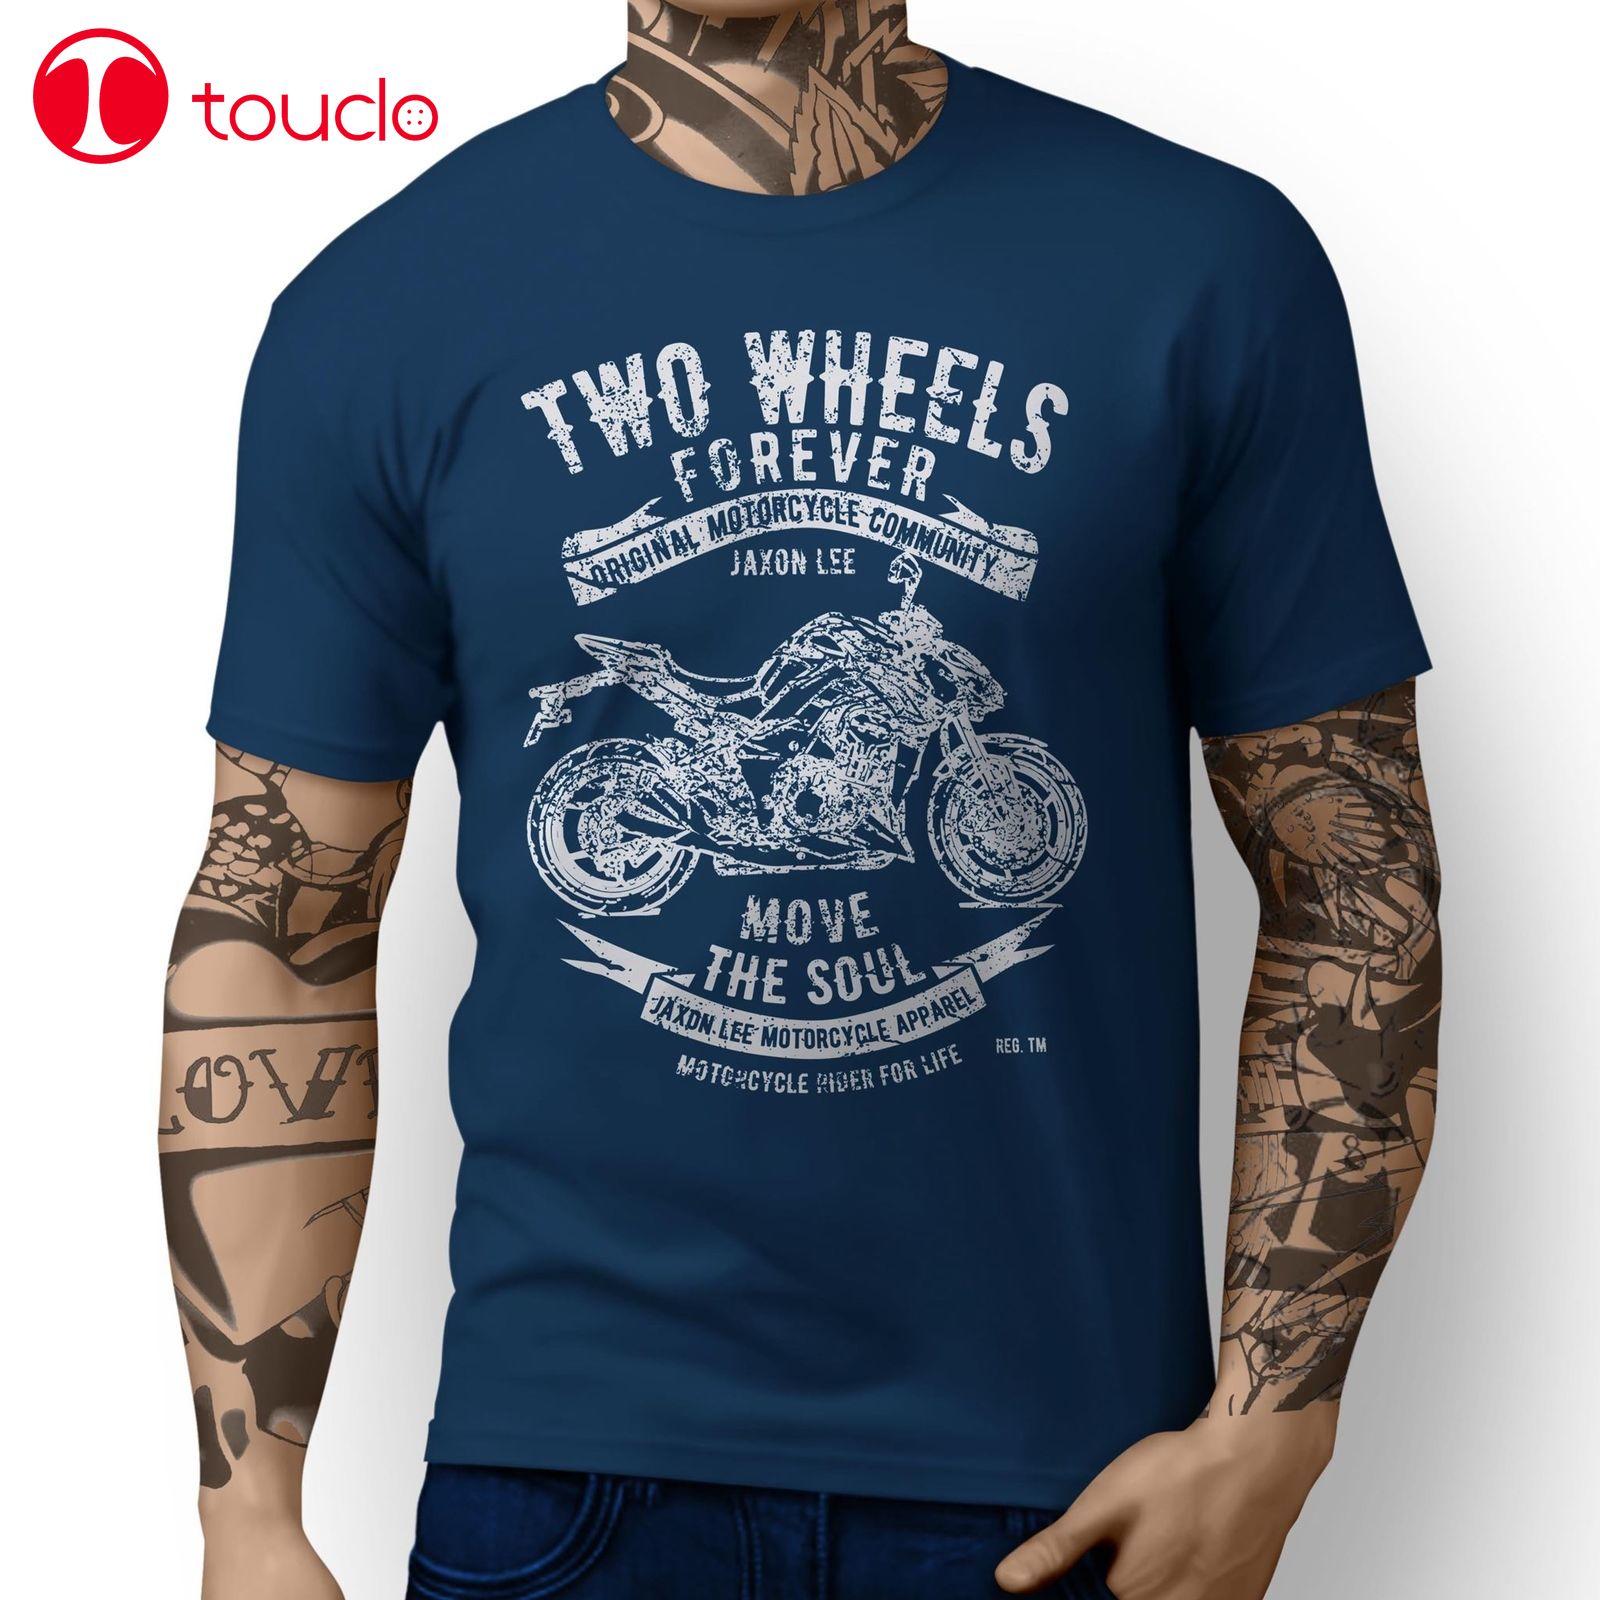 2019 nueva camiseta de manga corta japonesa clásica motocicleta Z1000 inspirado motocicleta arte diseño camiseta sudaderas con capucha